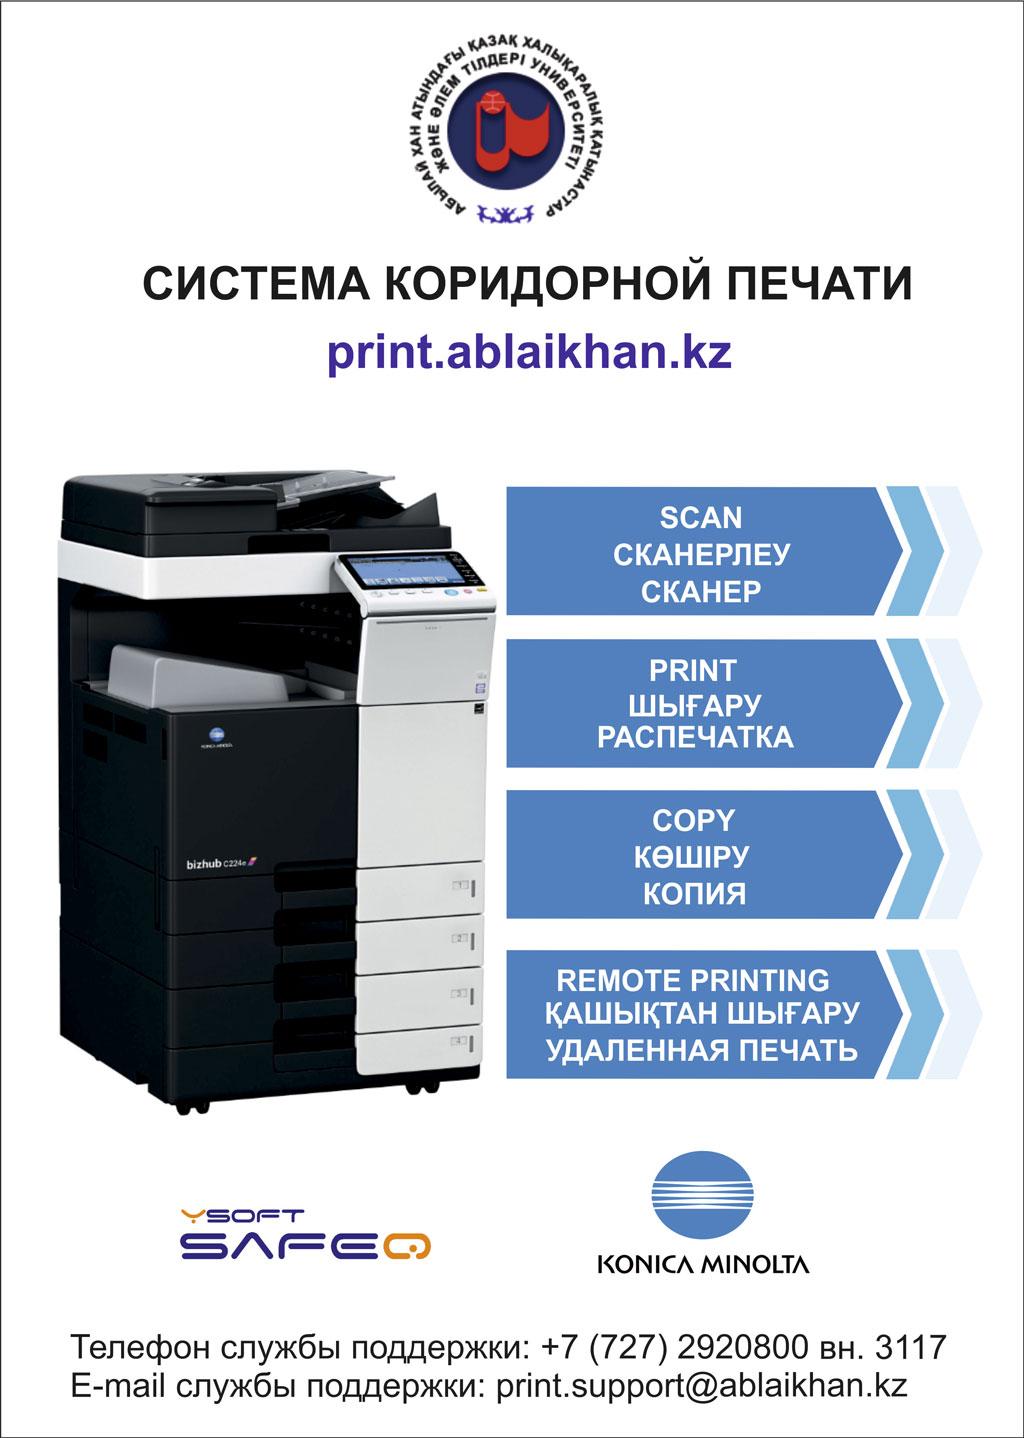 Система Коридорной печати